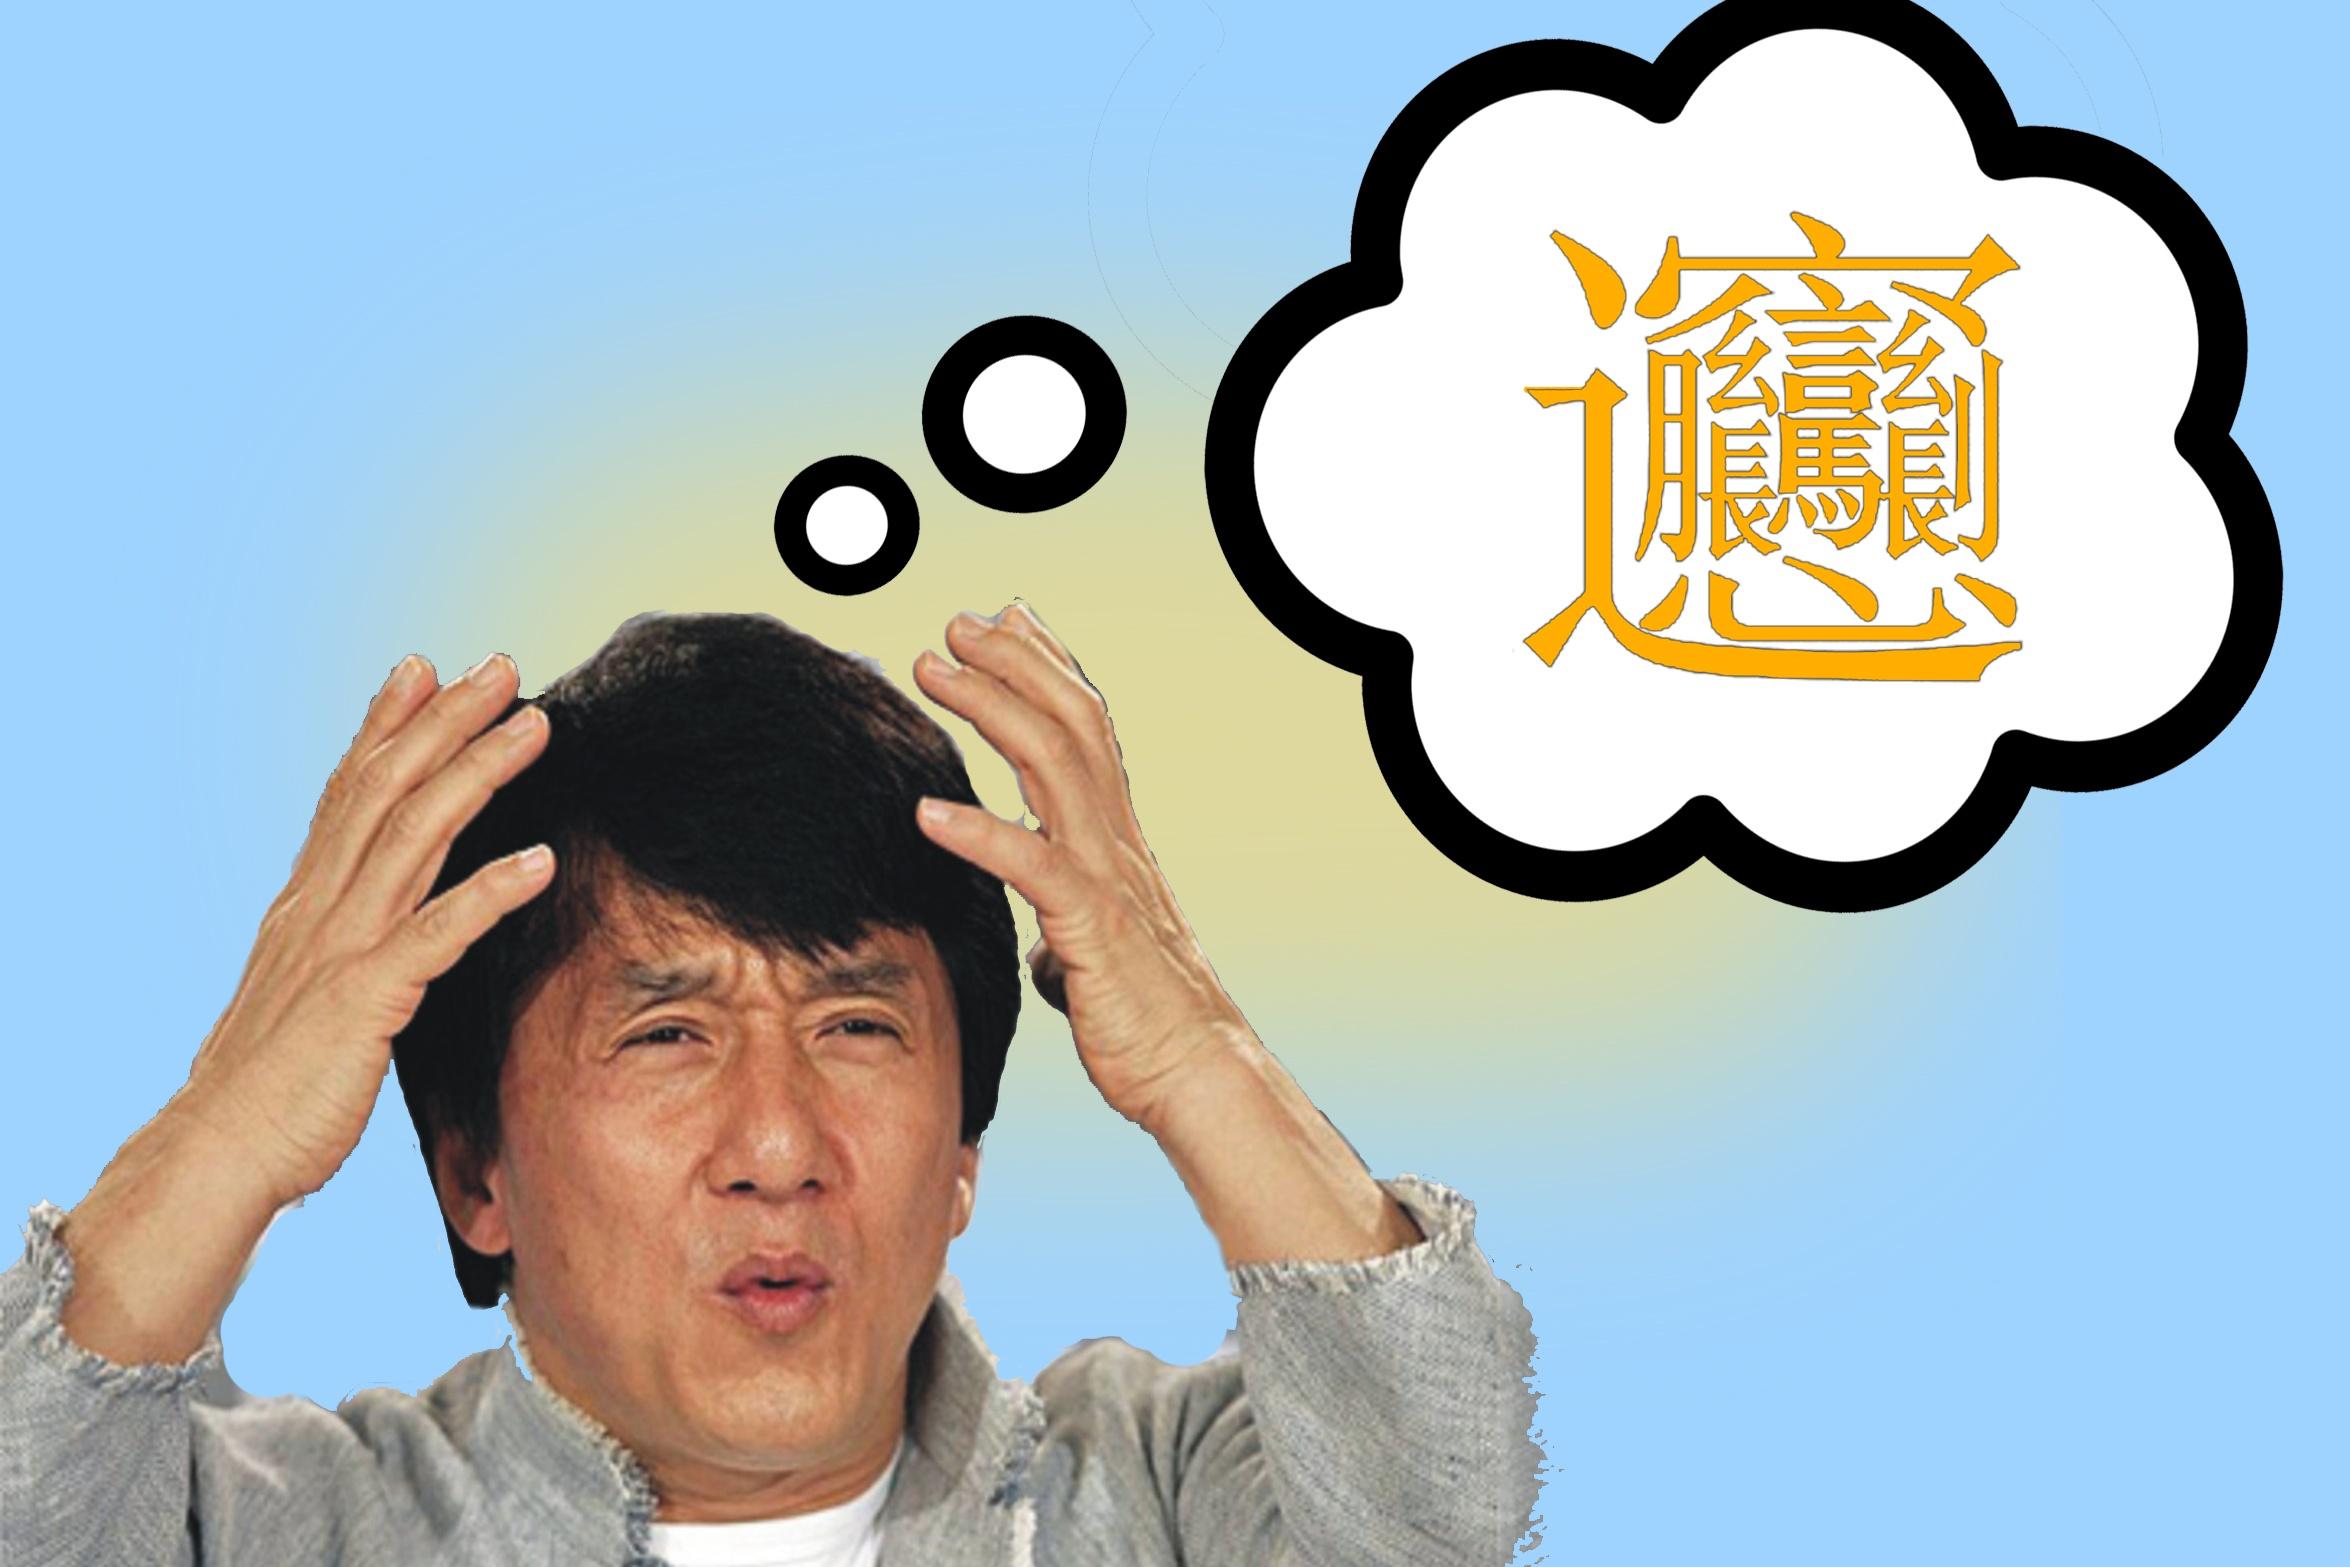 odd_chinese_characters.jpg